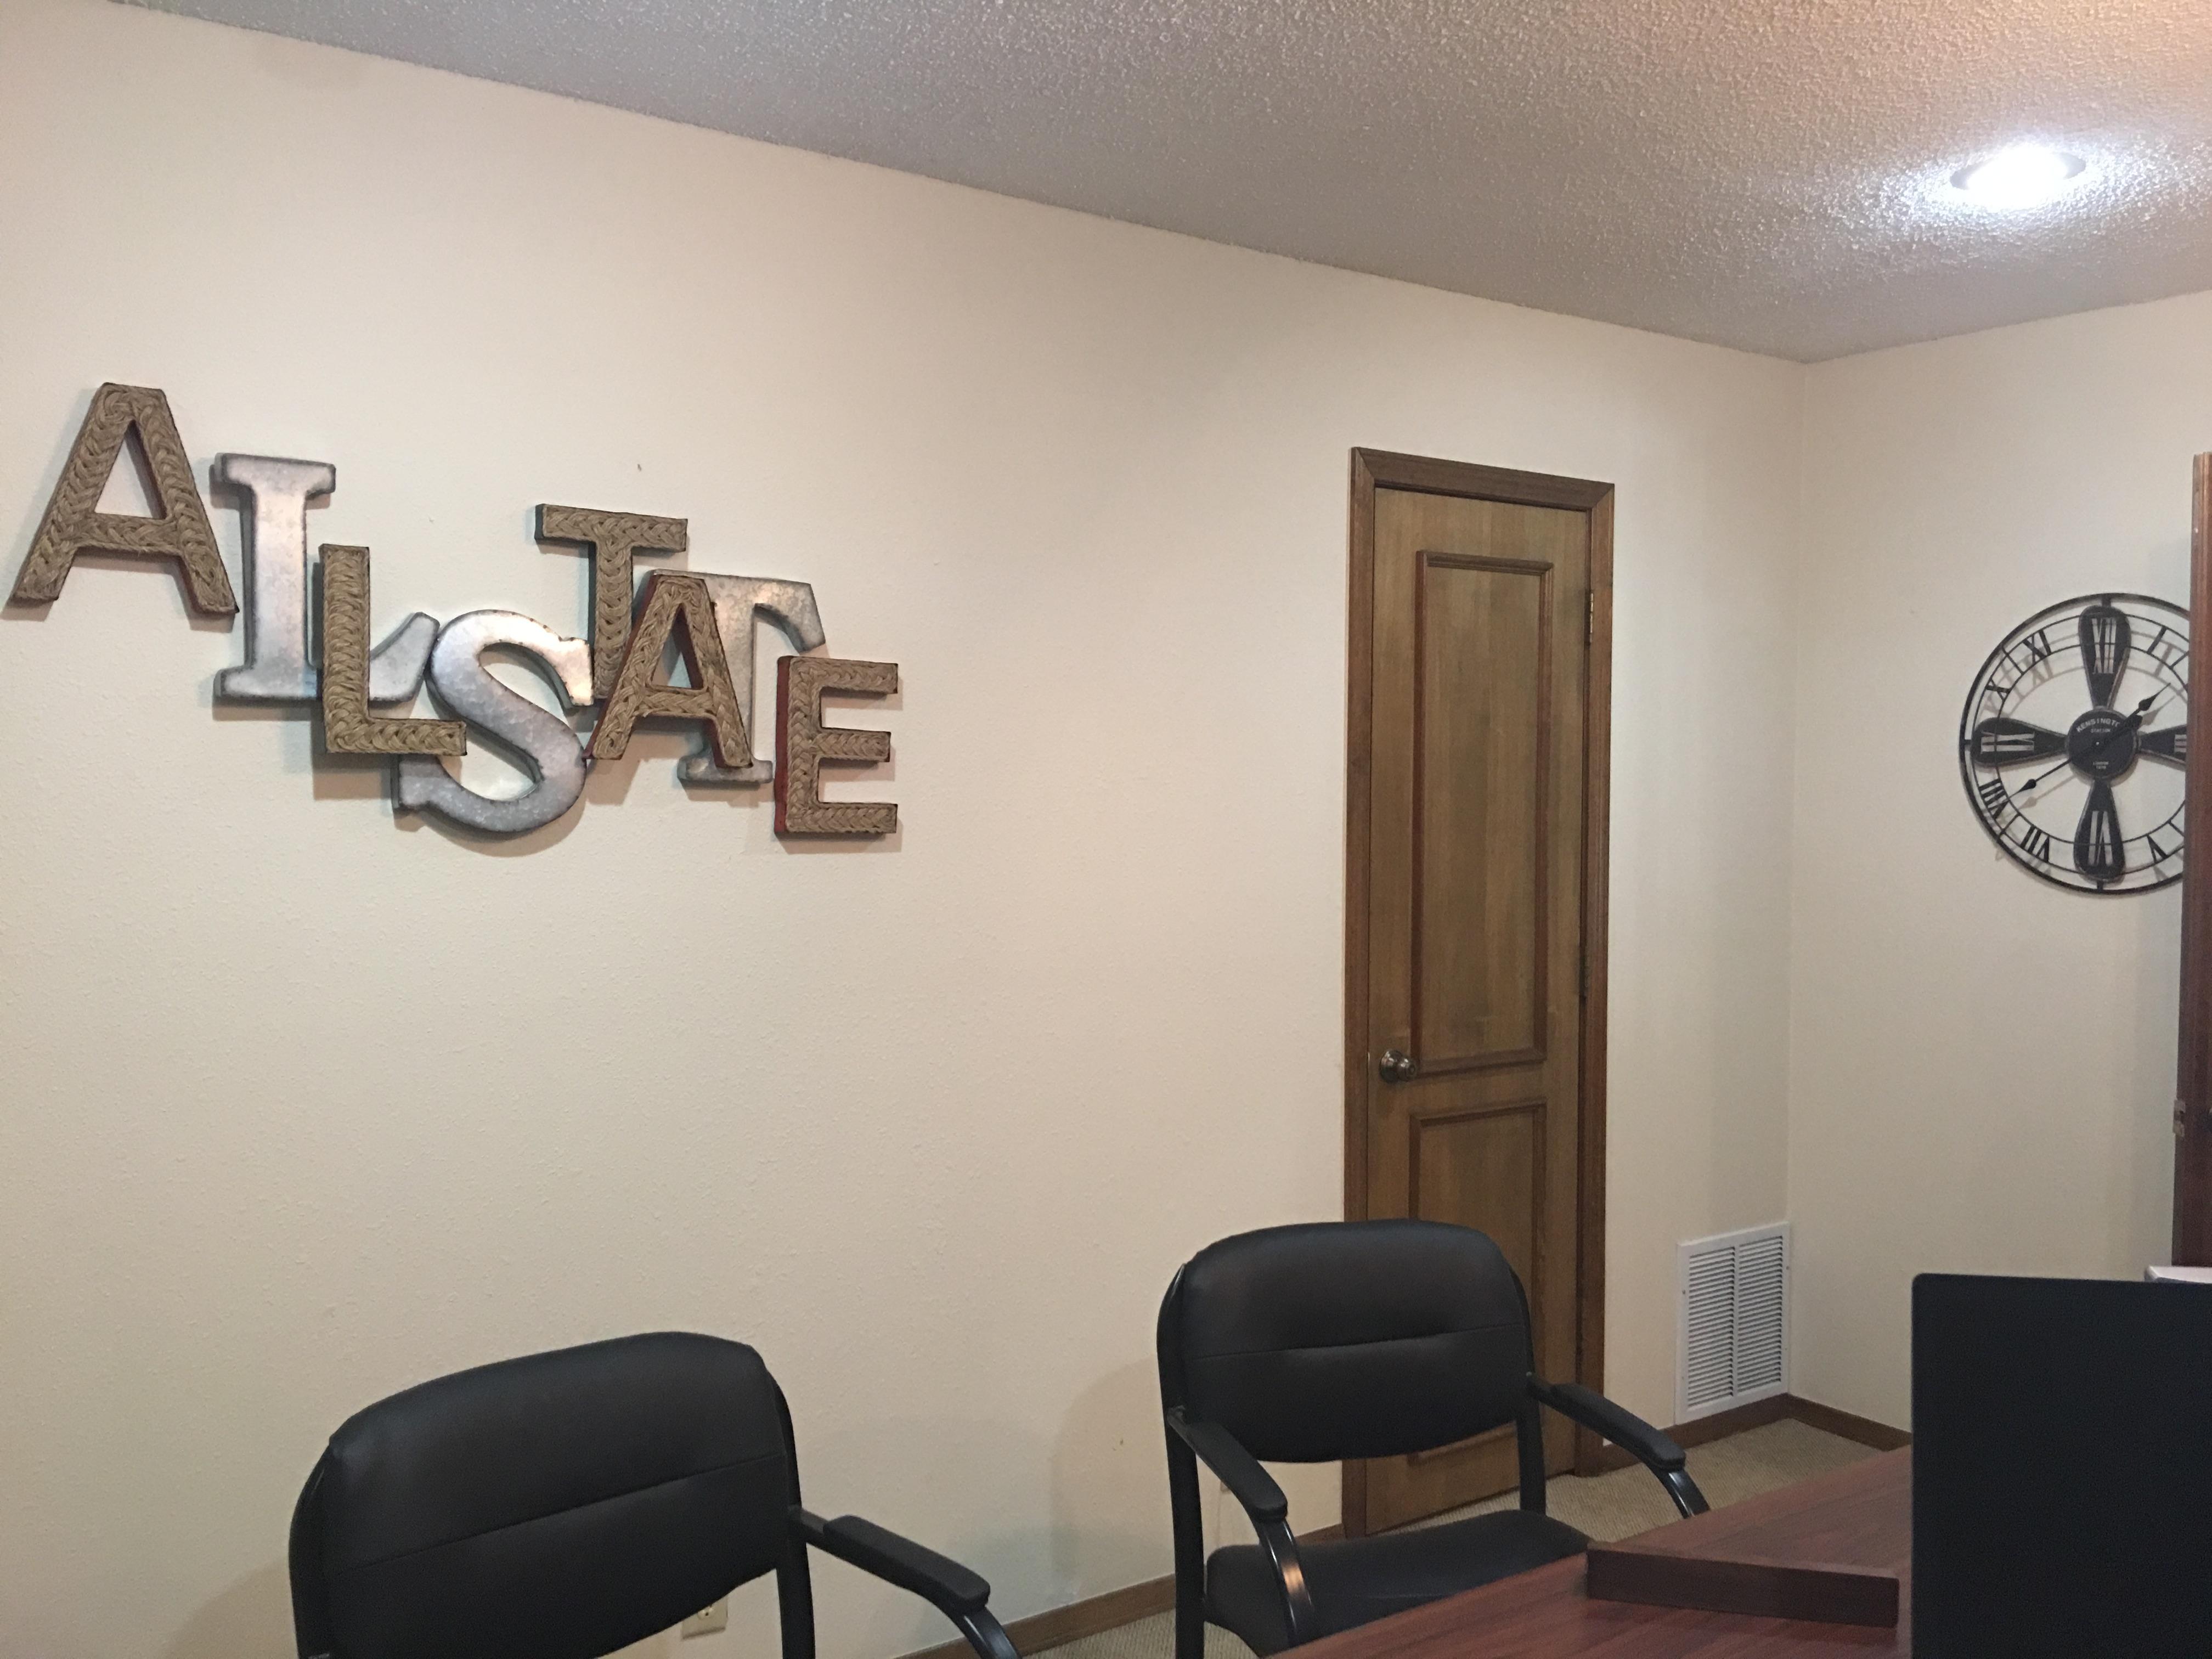 Jason Bilhartz: Allstate Insurance image 5